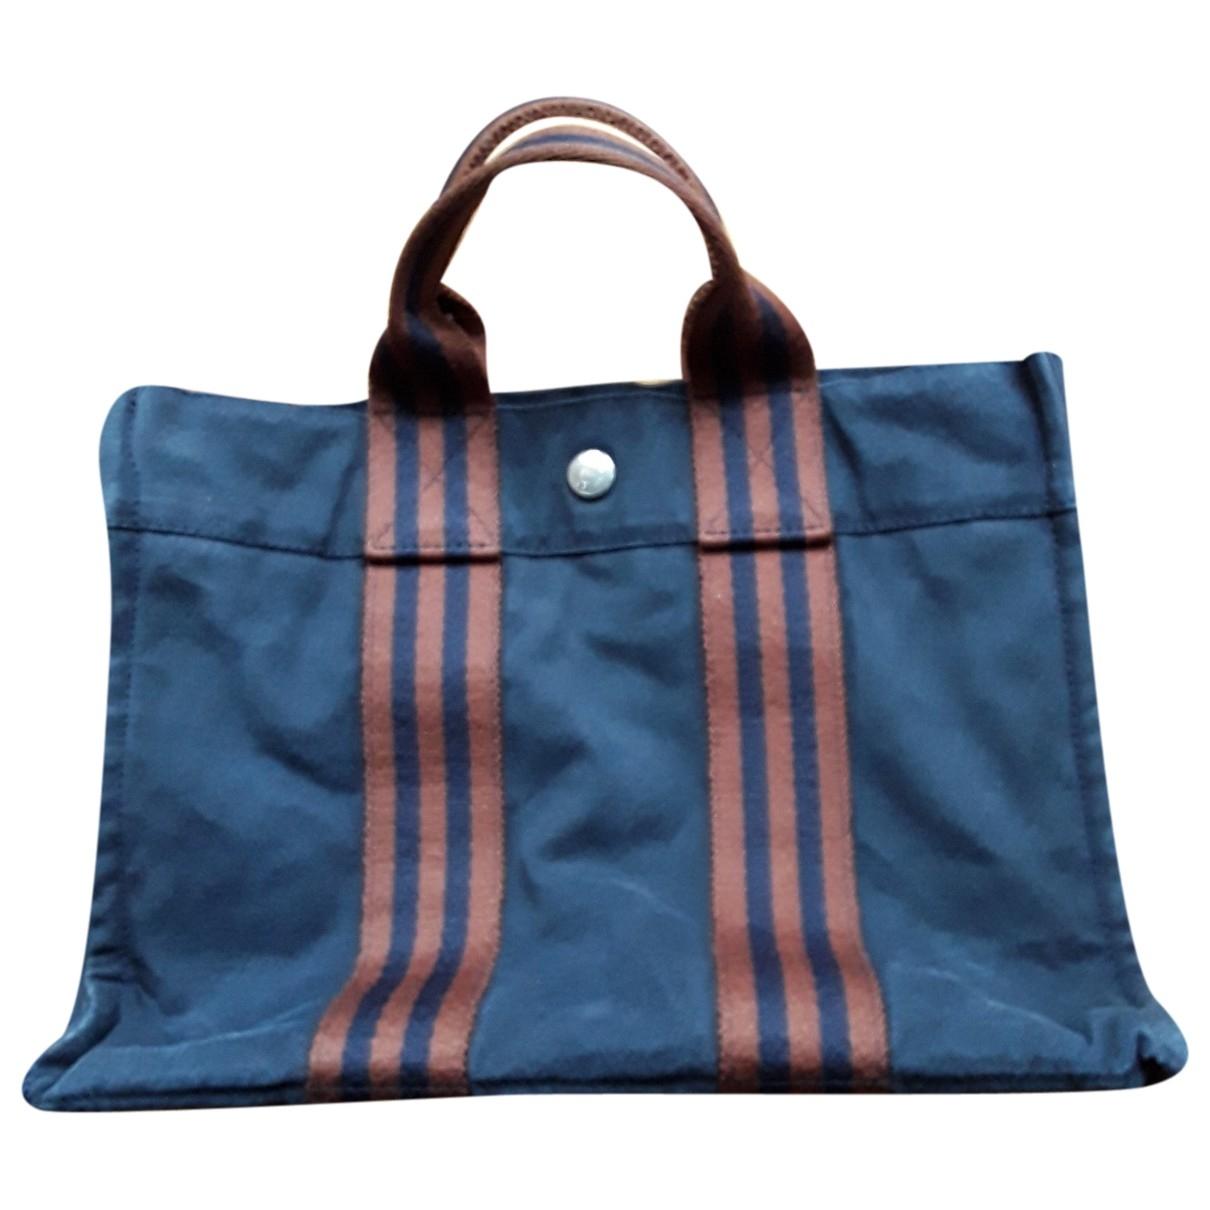 Hermes Toto Handtasche in  Blau Baumwolle